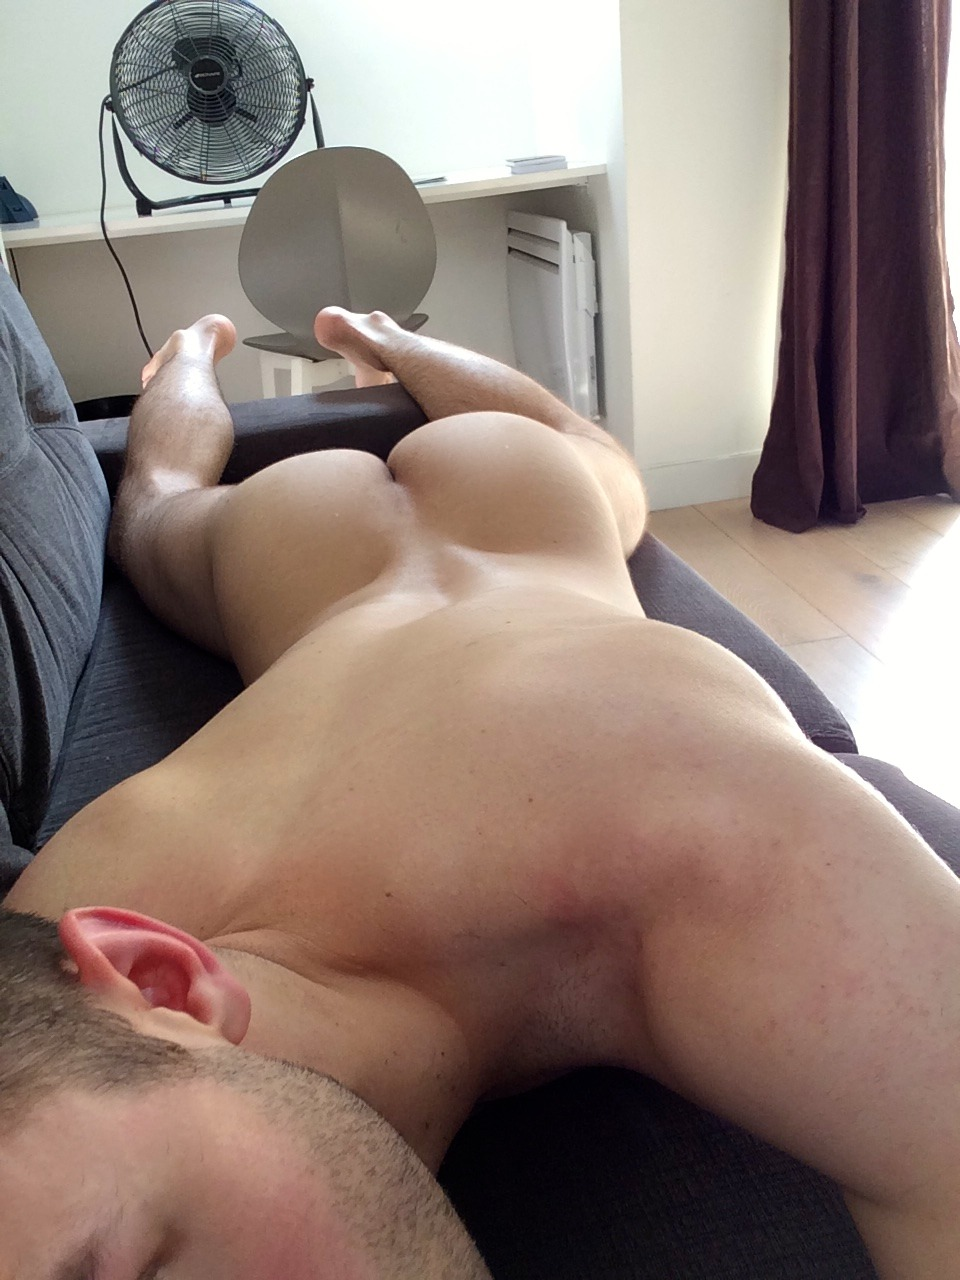 tumblr nude butt